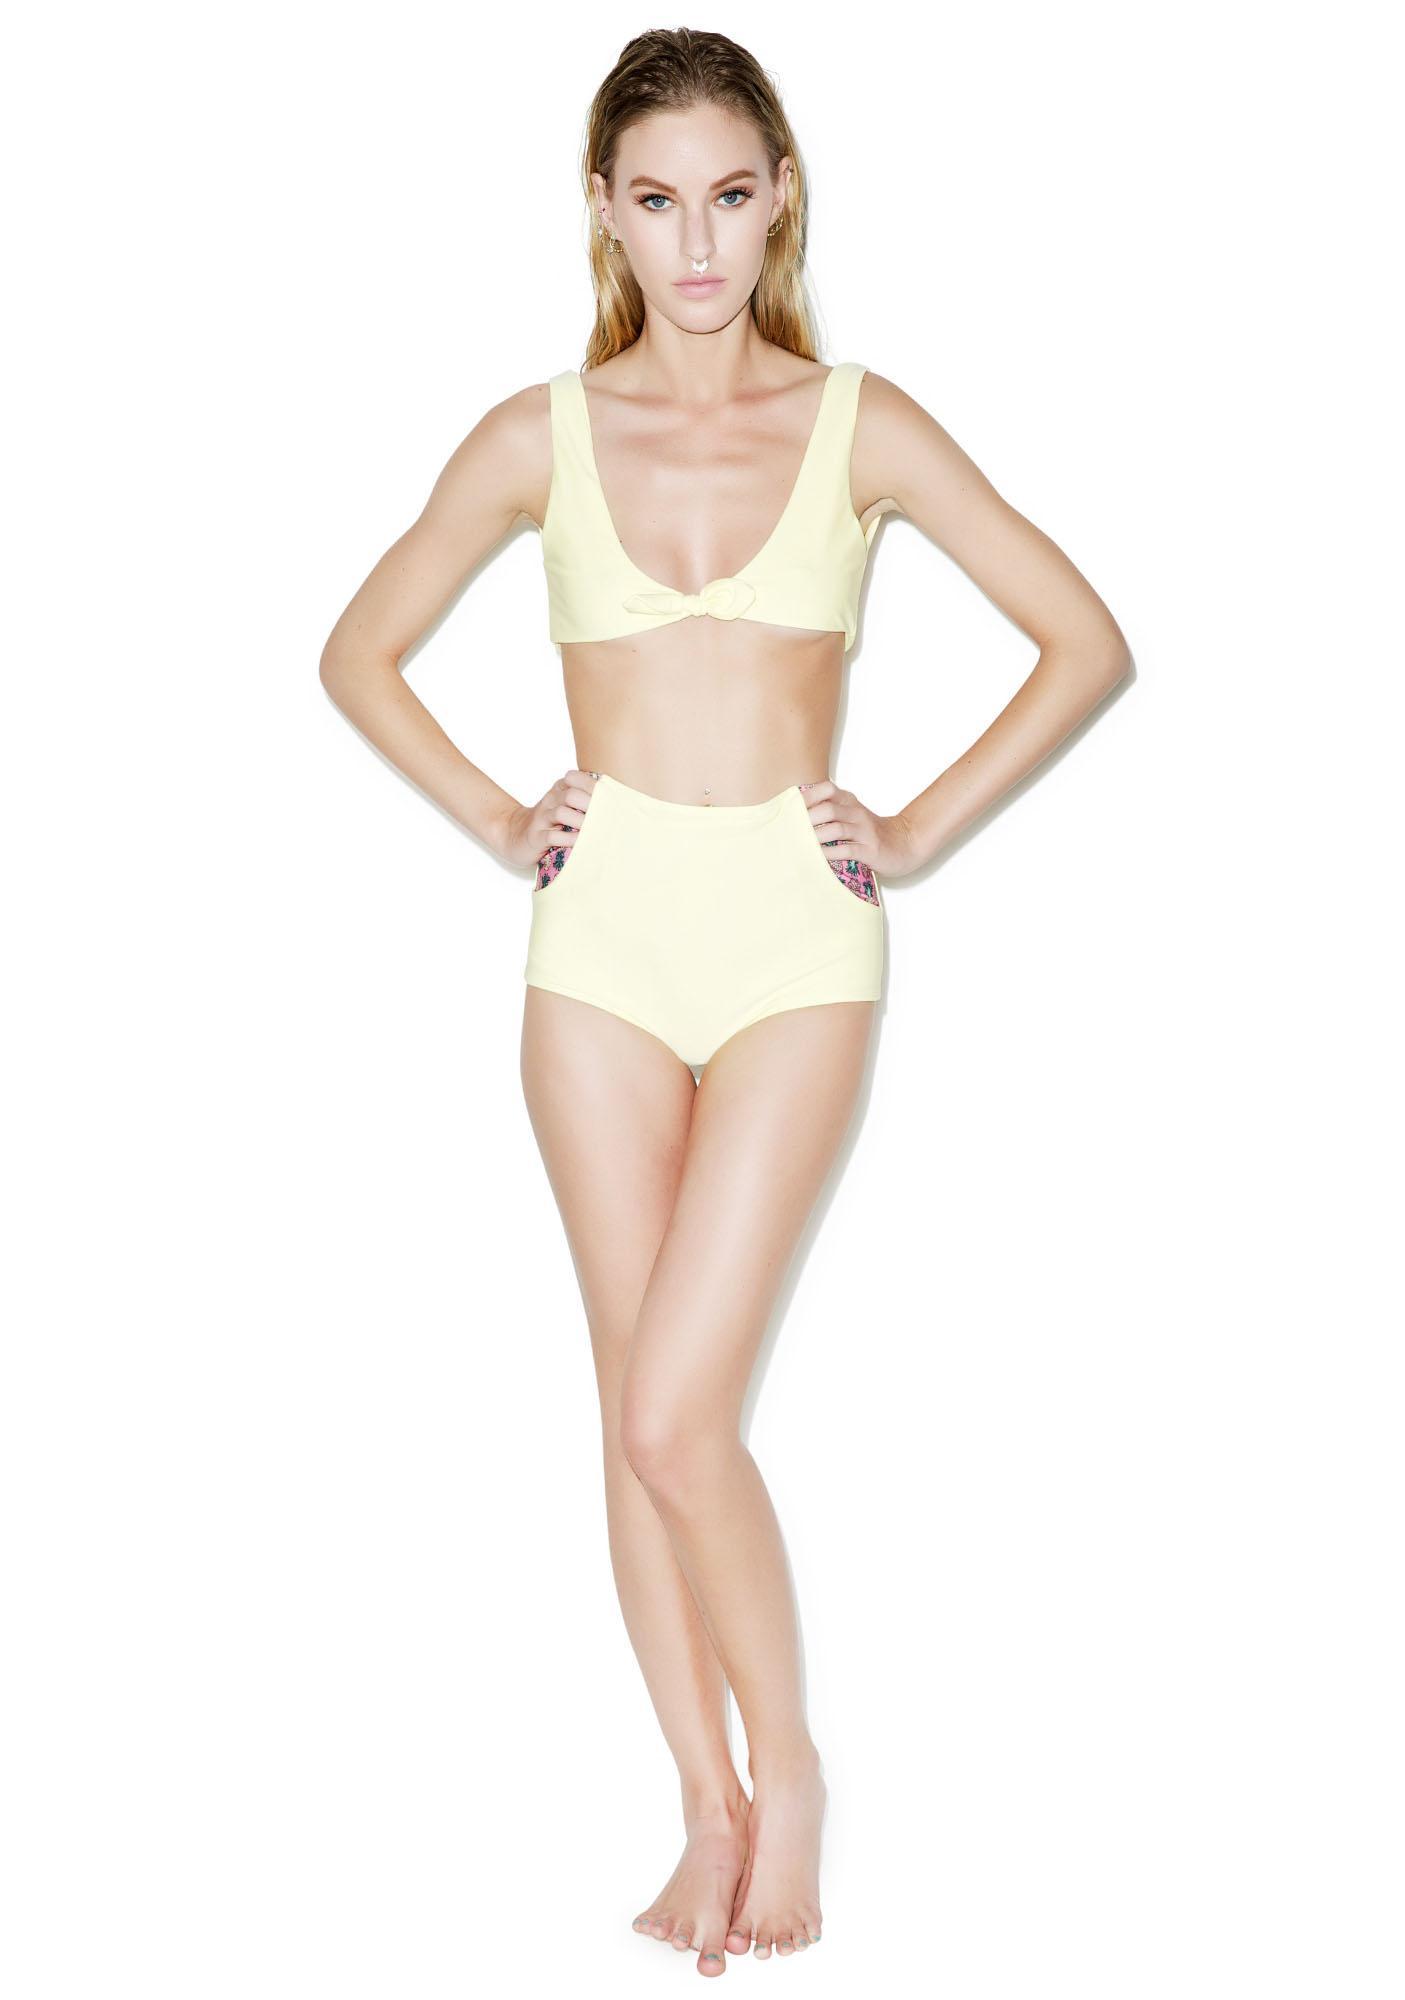 Lolli Swim Lemons Bikini Top